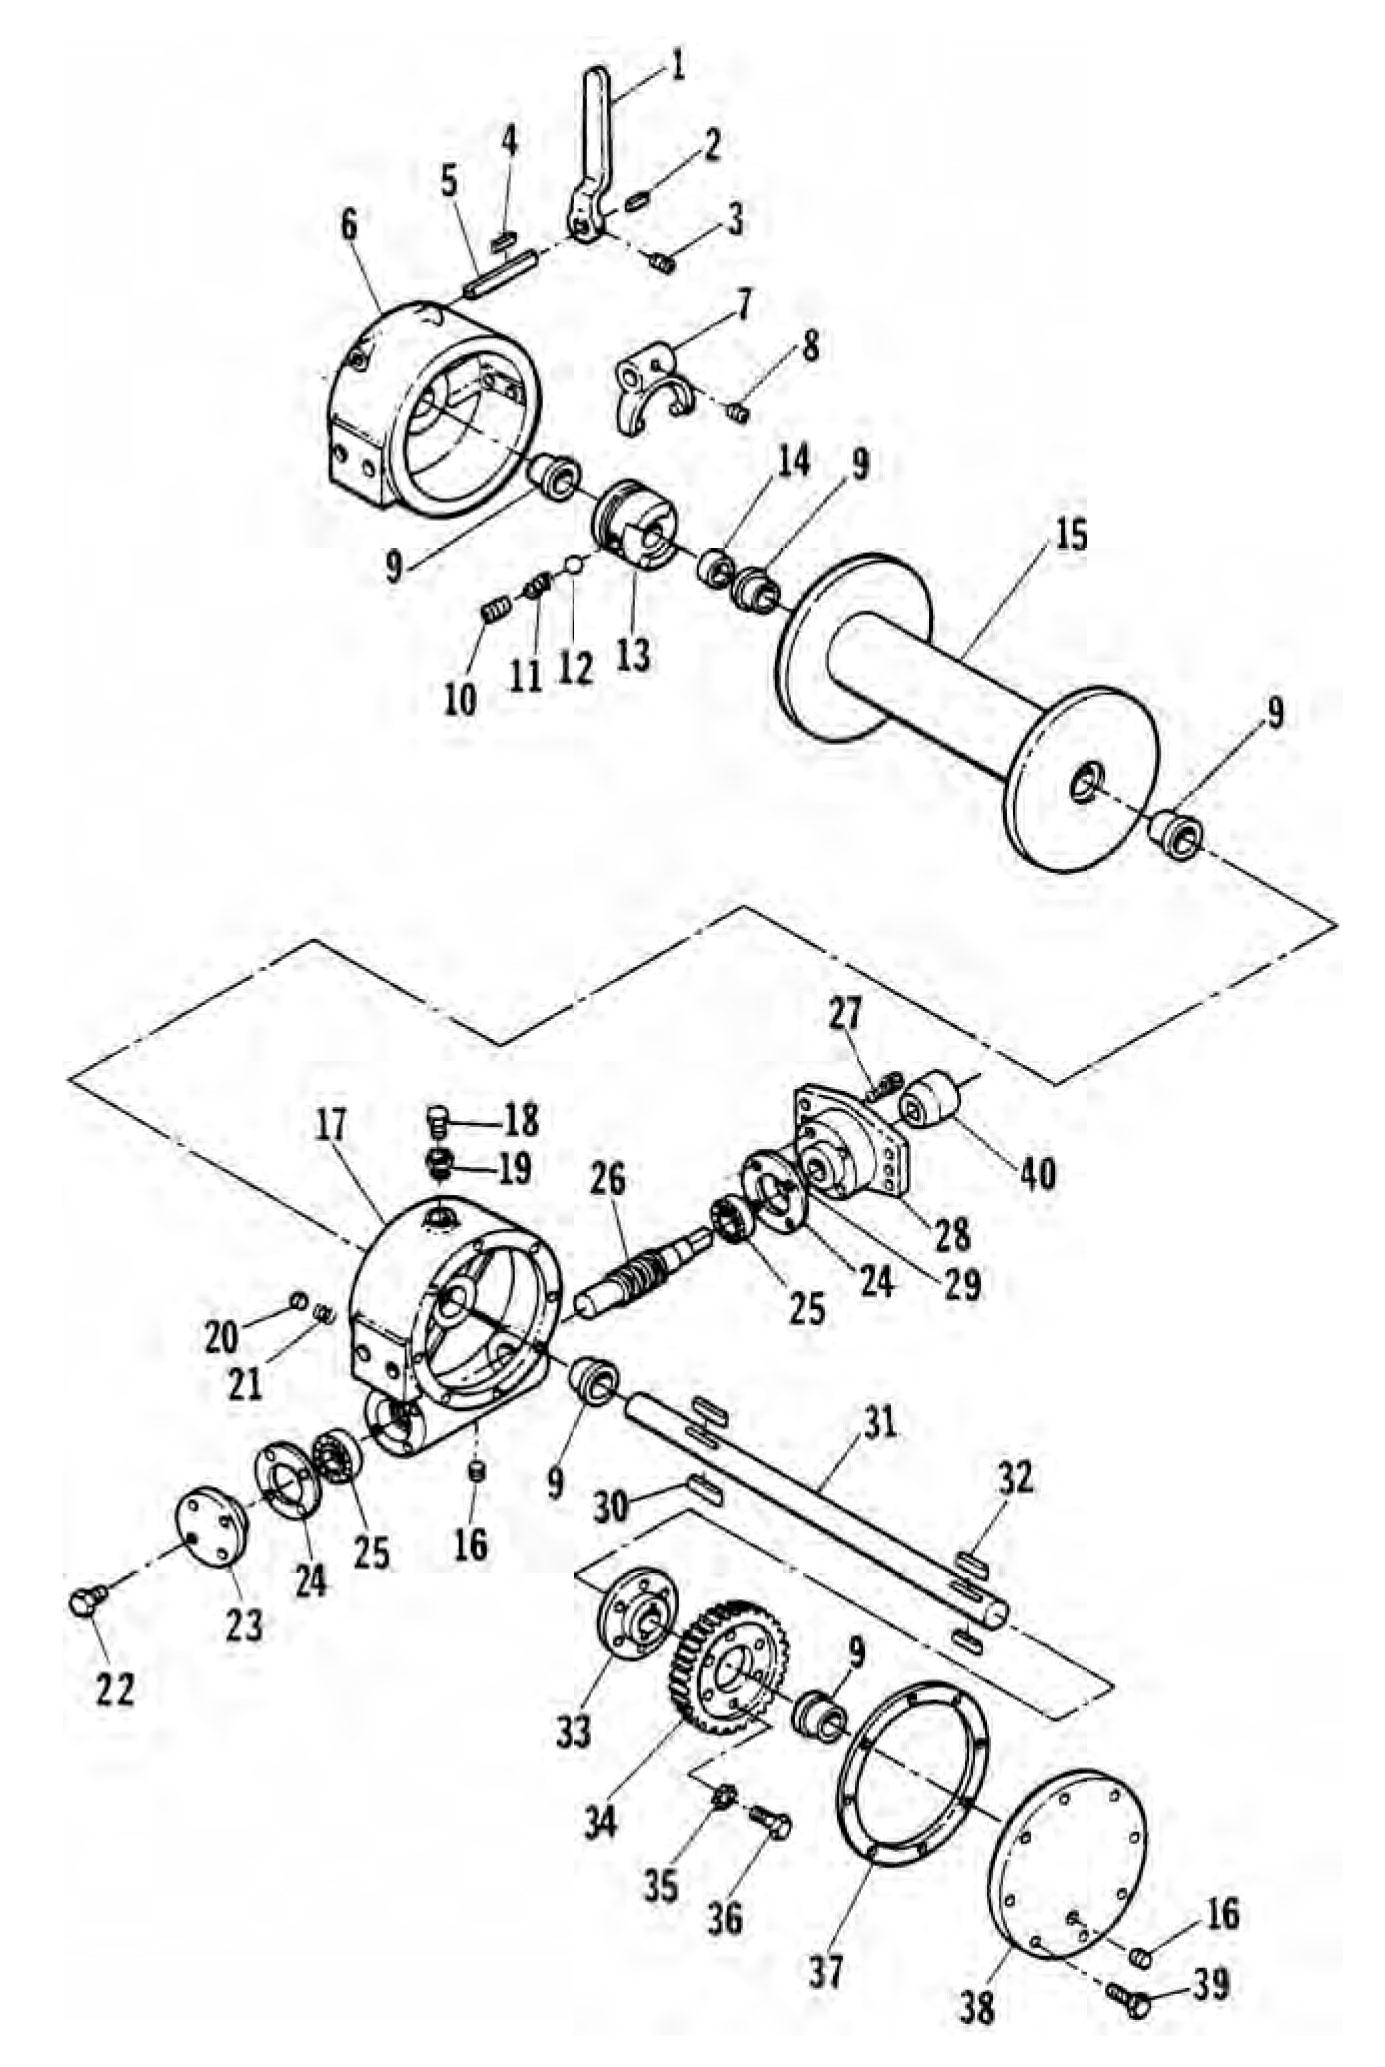 medium resolution of ramsey hydraulic winch parts diagram wiring library ramsey winch schematics 712 hydraulic winch assembly ramsey hydraulic